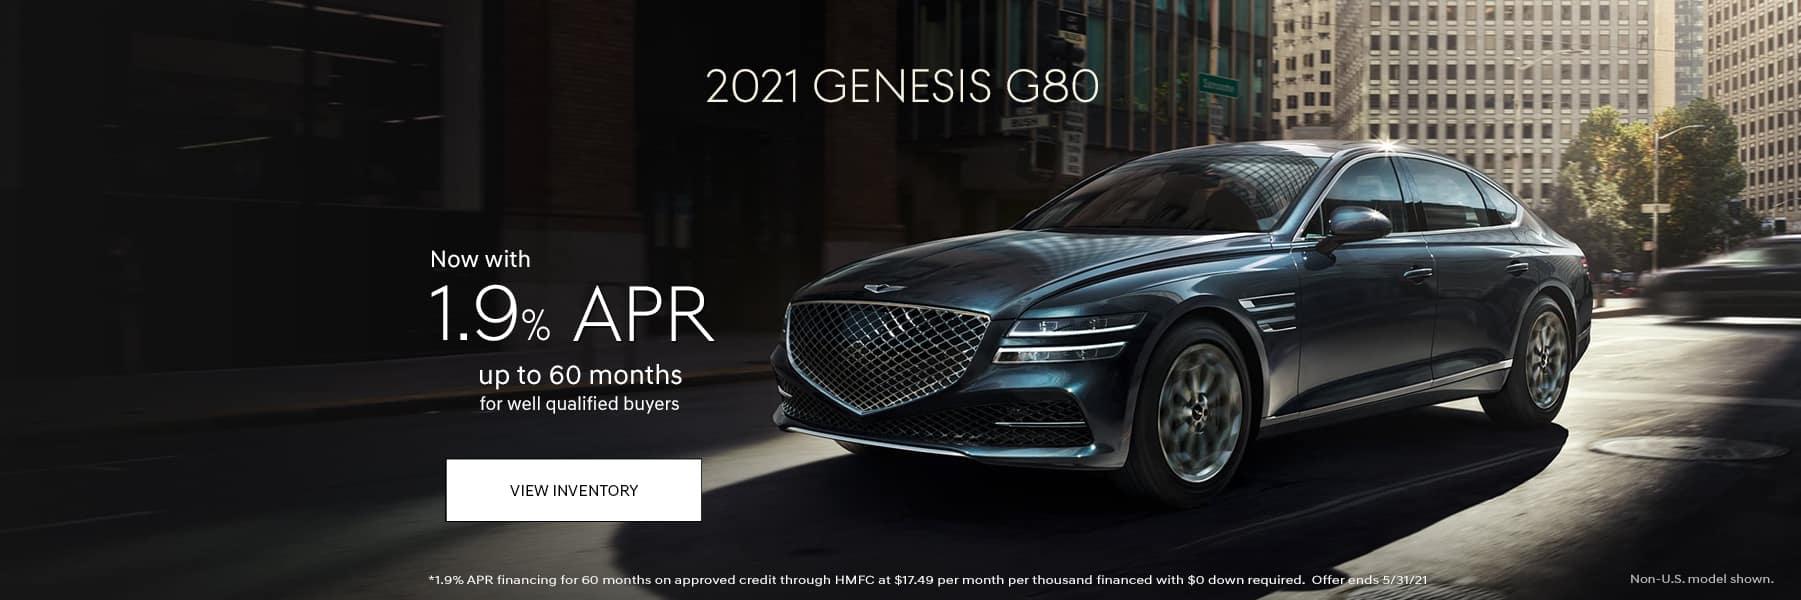 2021-Genesis-G80-May21